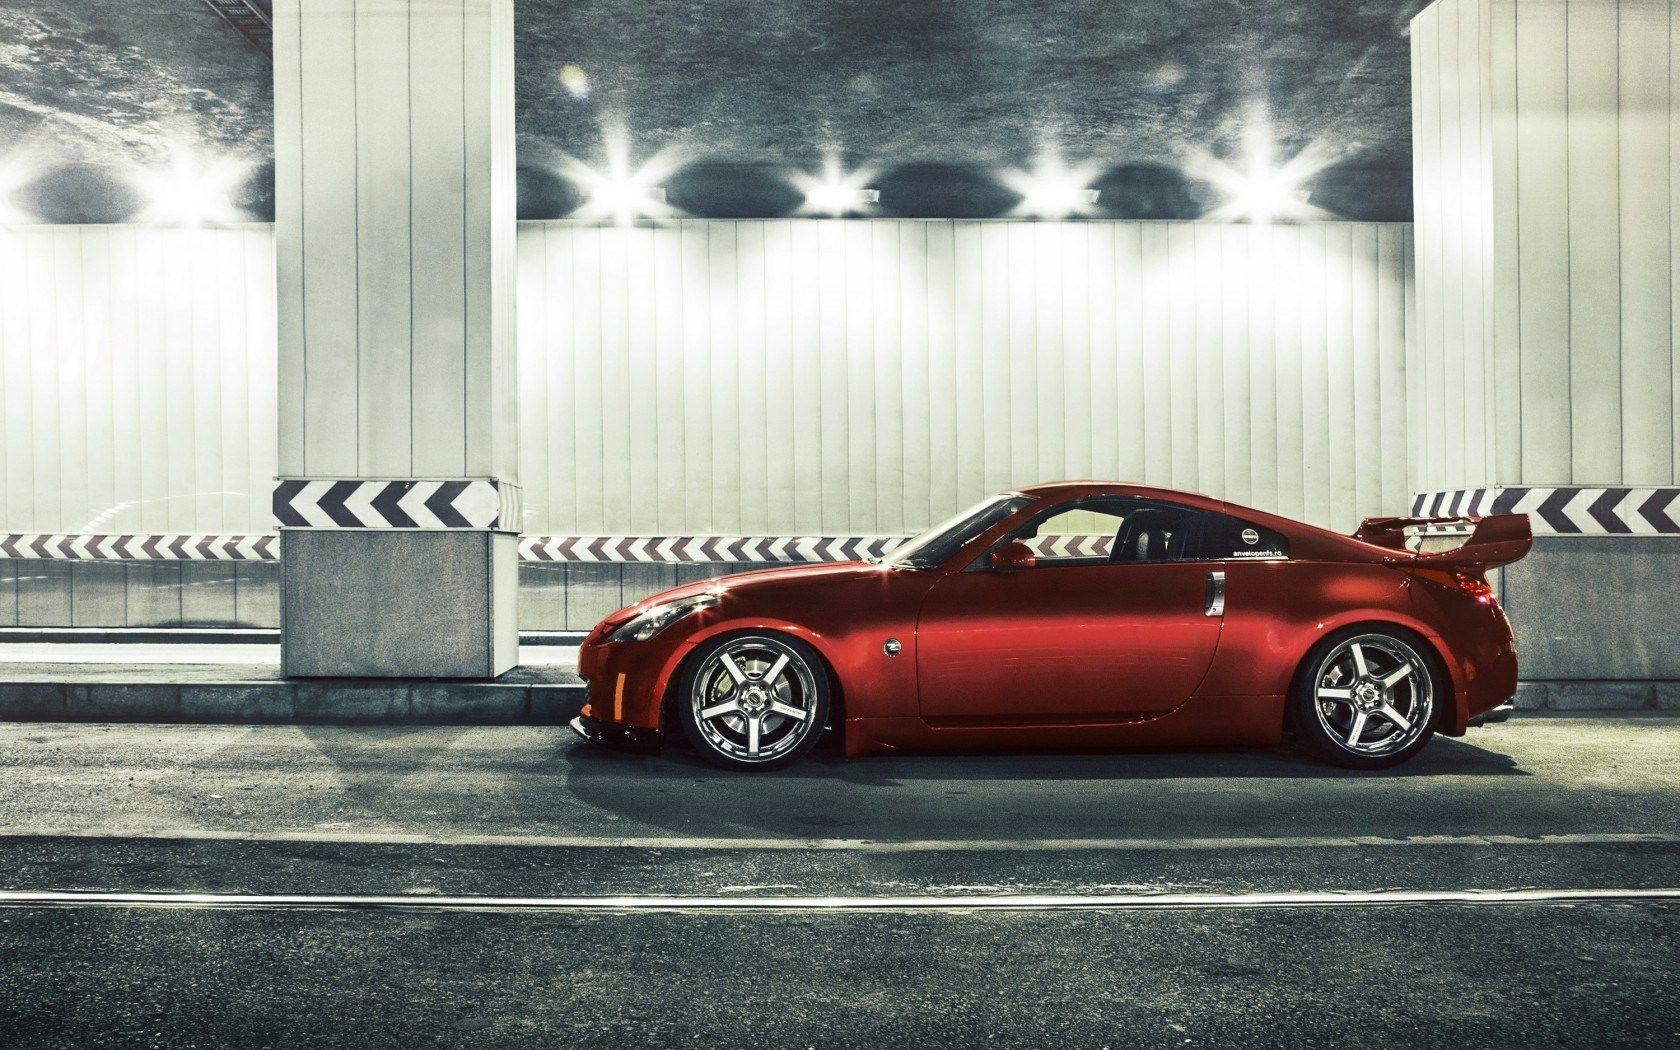 Nissan Z Tuning Car Street Hd Wallpaper